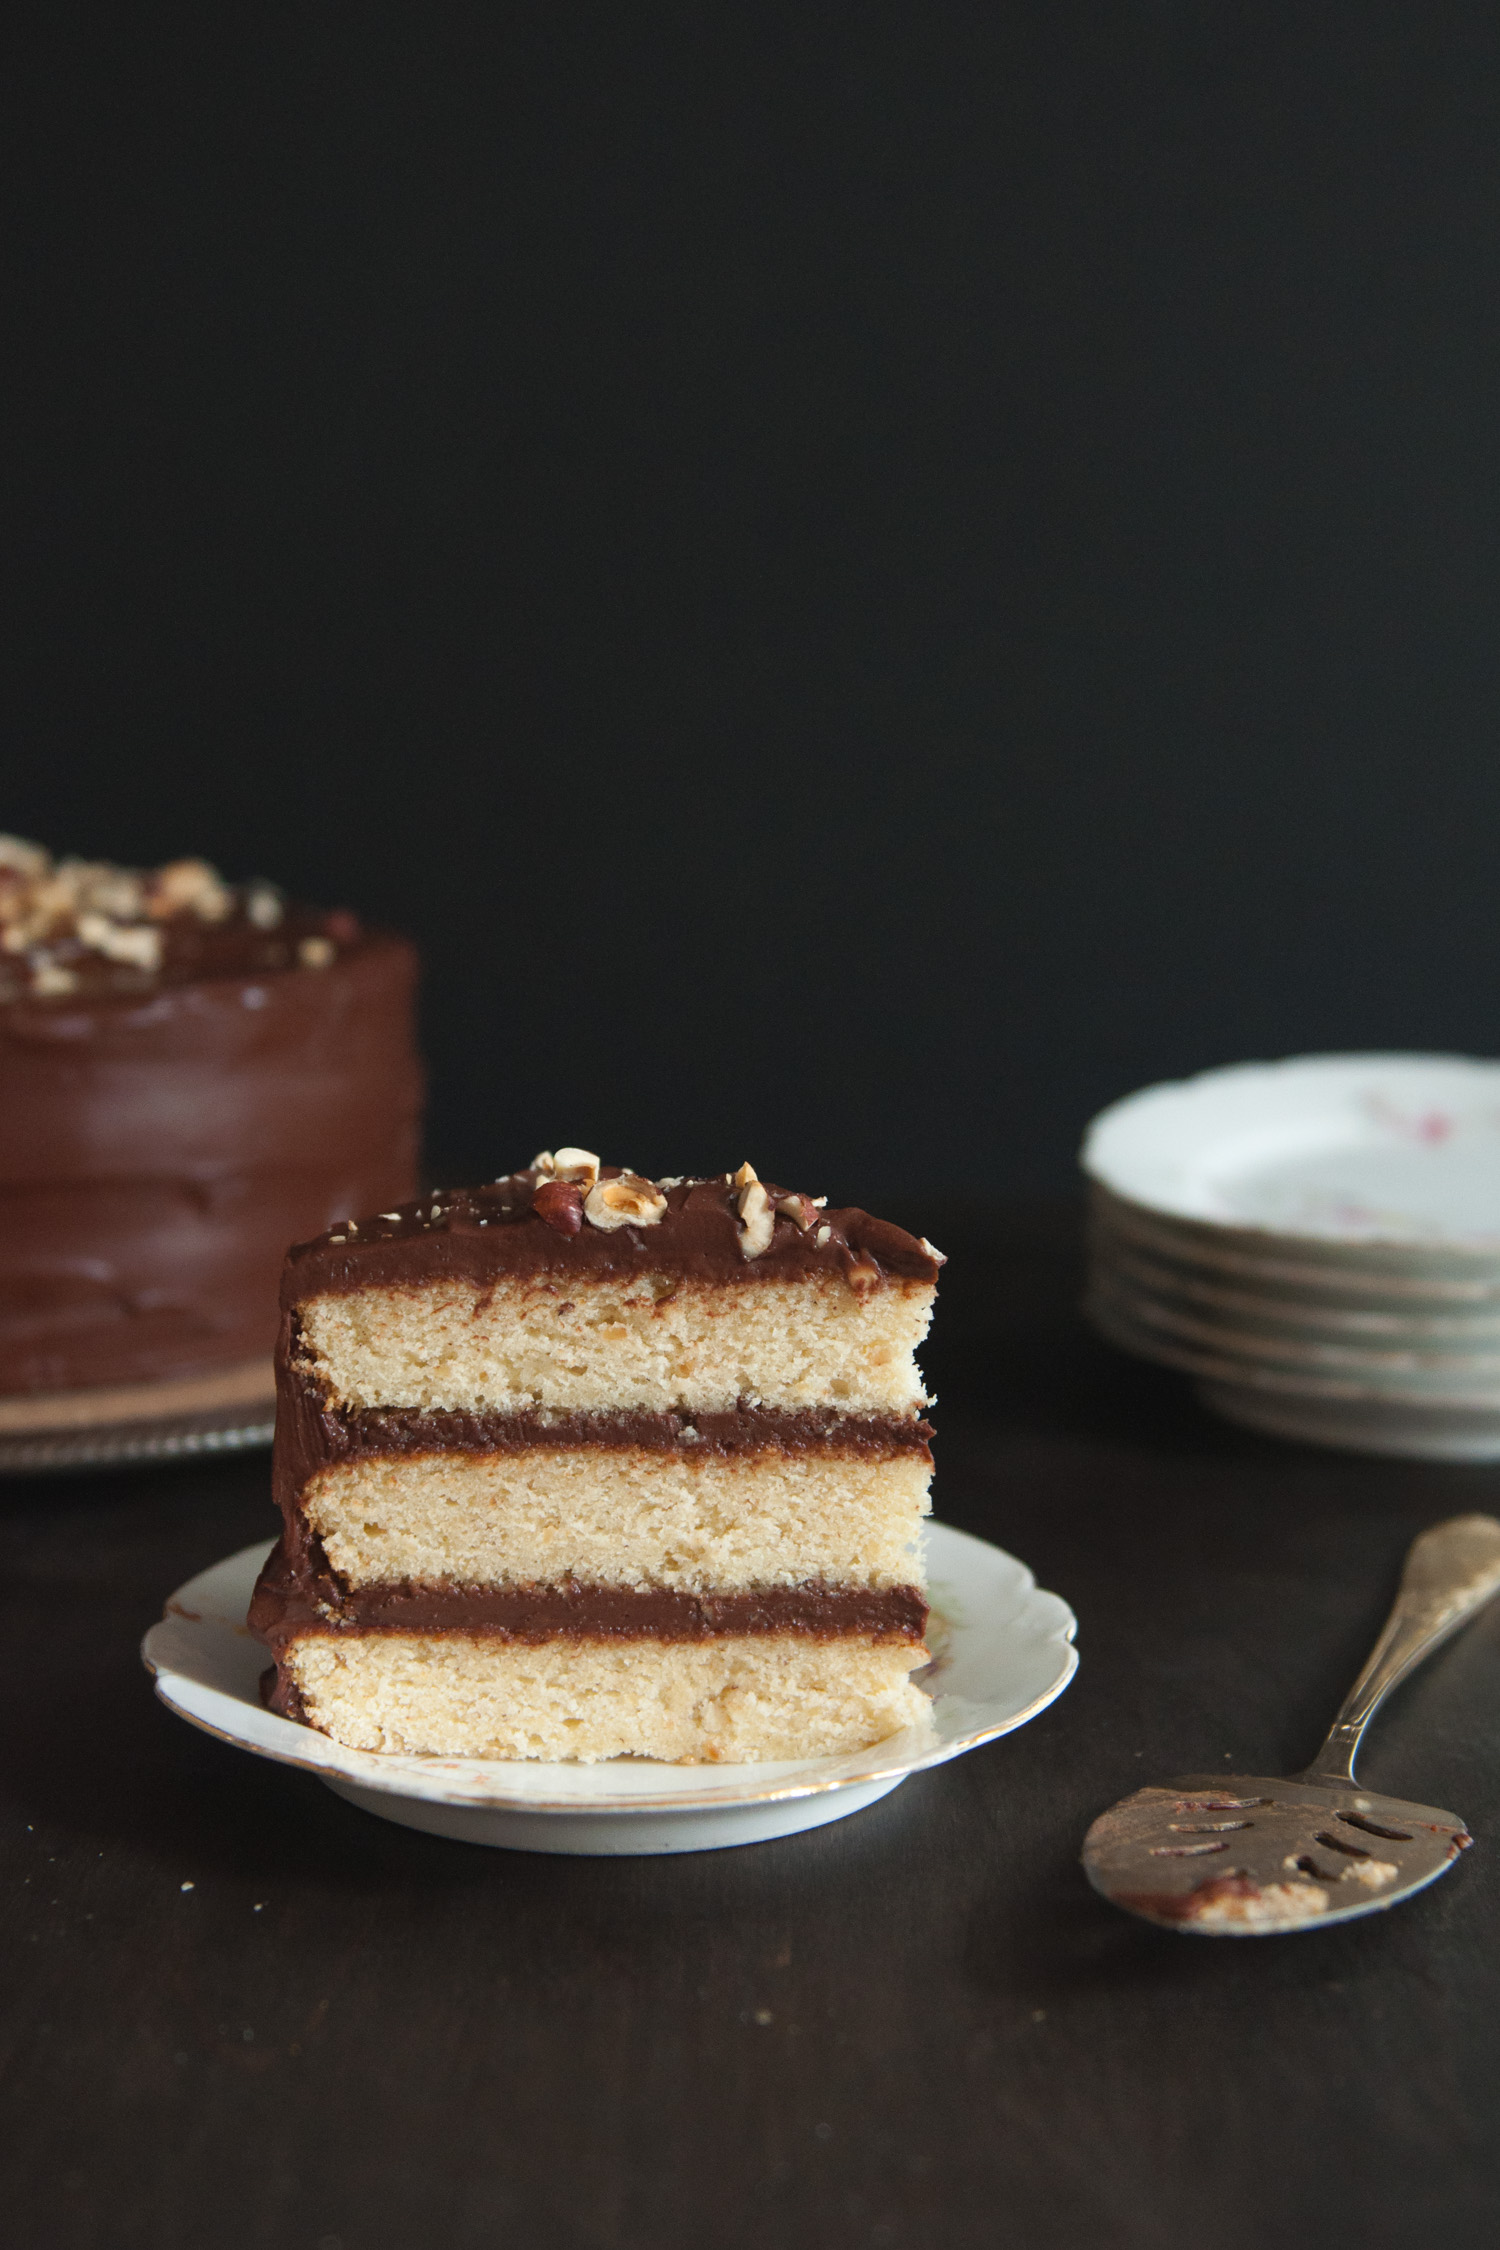 hazelnut_chocolate_cake8.jpg